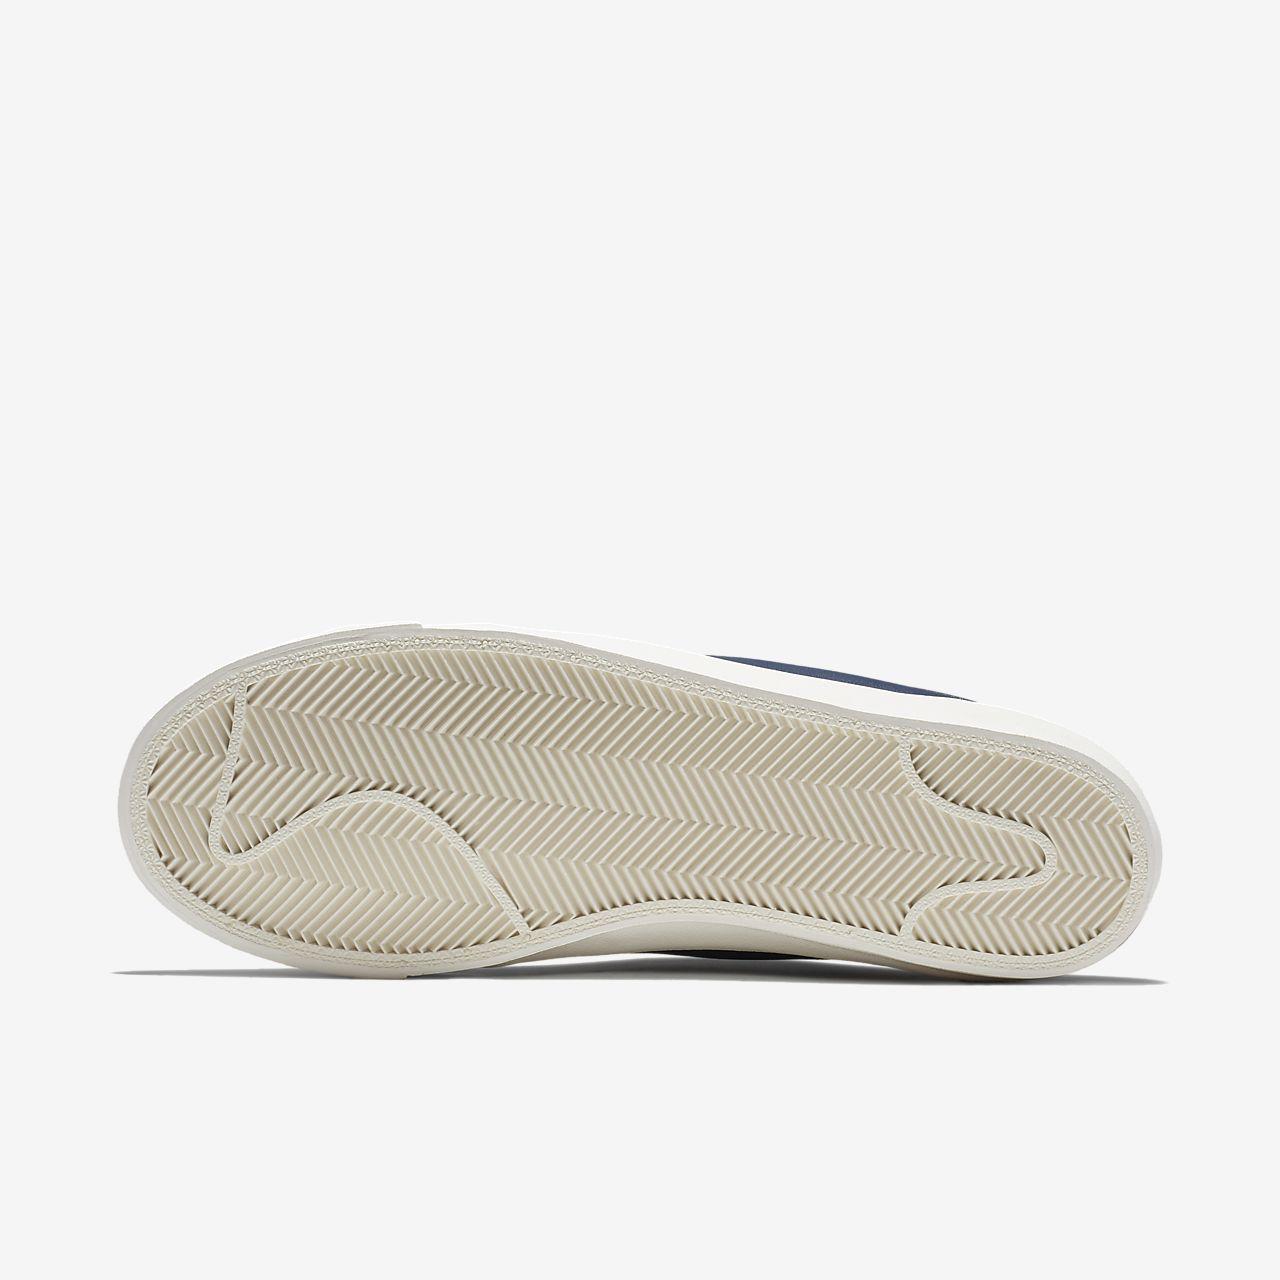 online store 42fe6 9c4db ... Calzado de skateboarding para hombre Nike SB Zoom Blazer Low XT QS